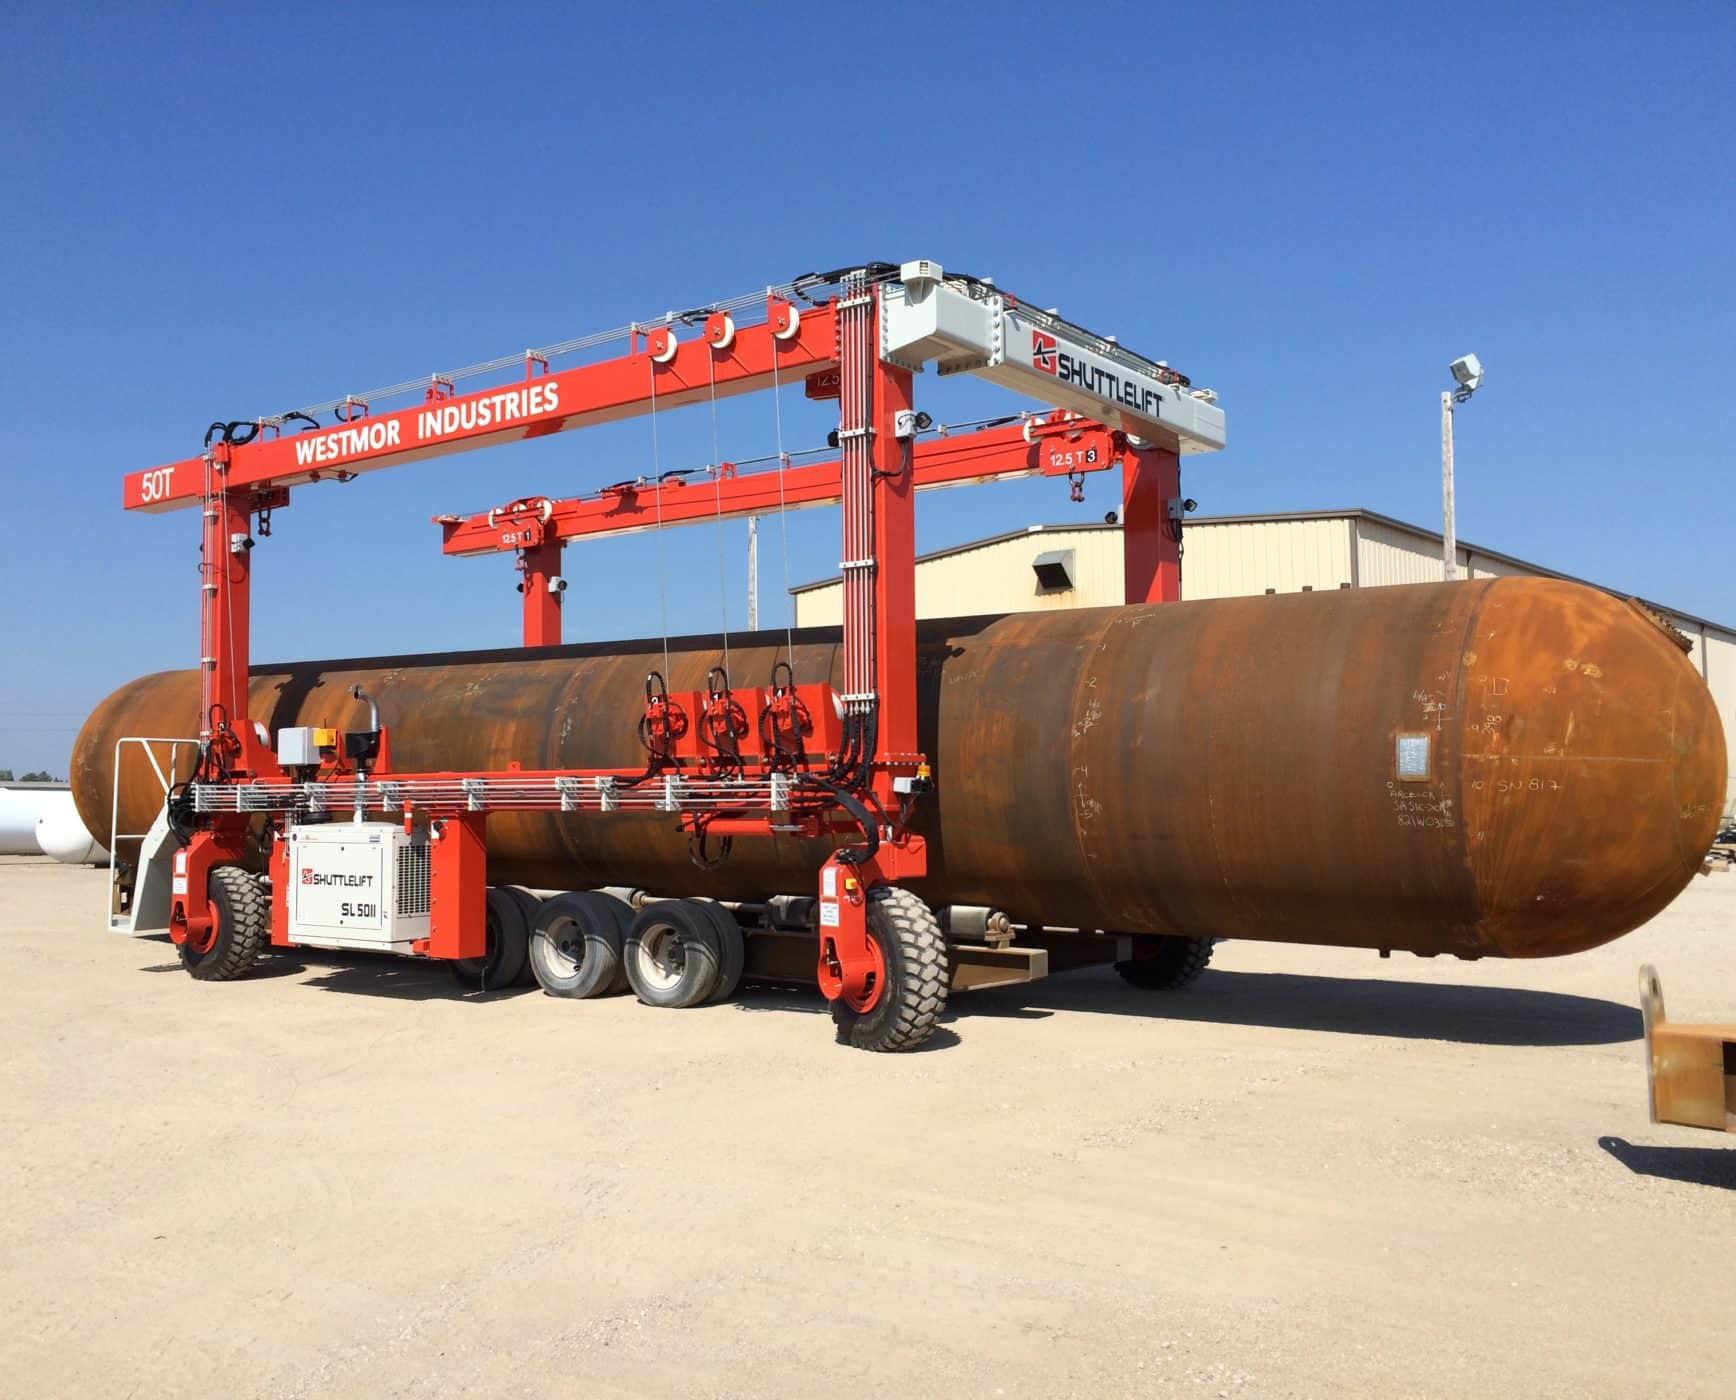 SL Series rubber-tired gantry crane hauling large steel tank